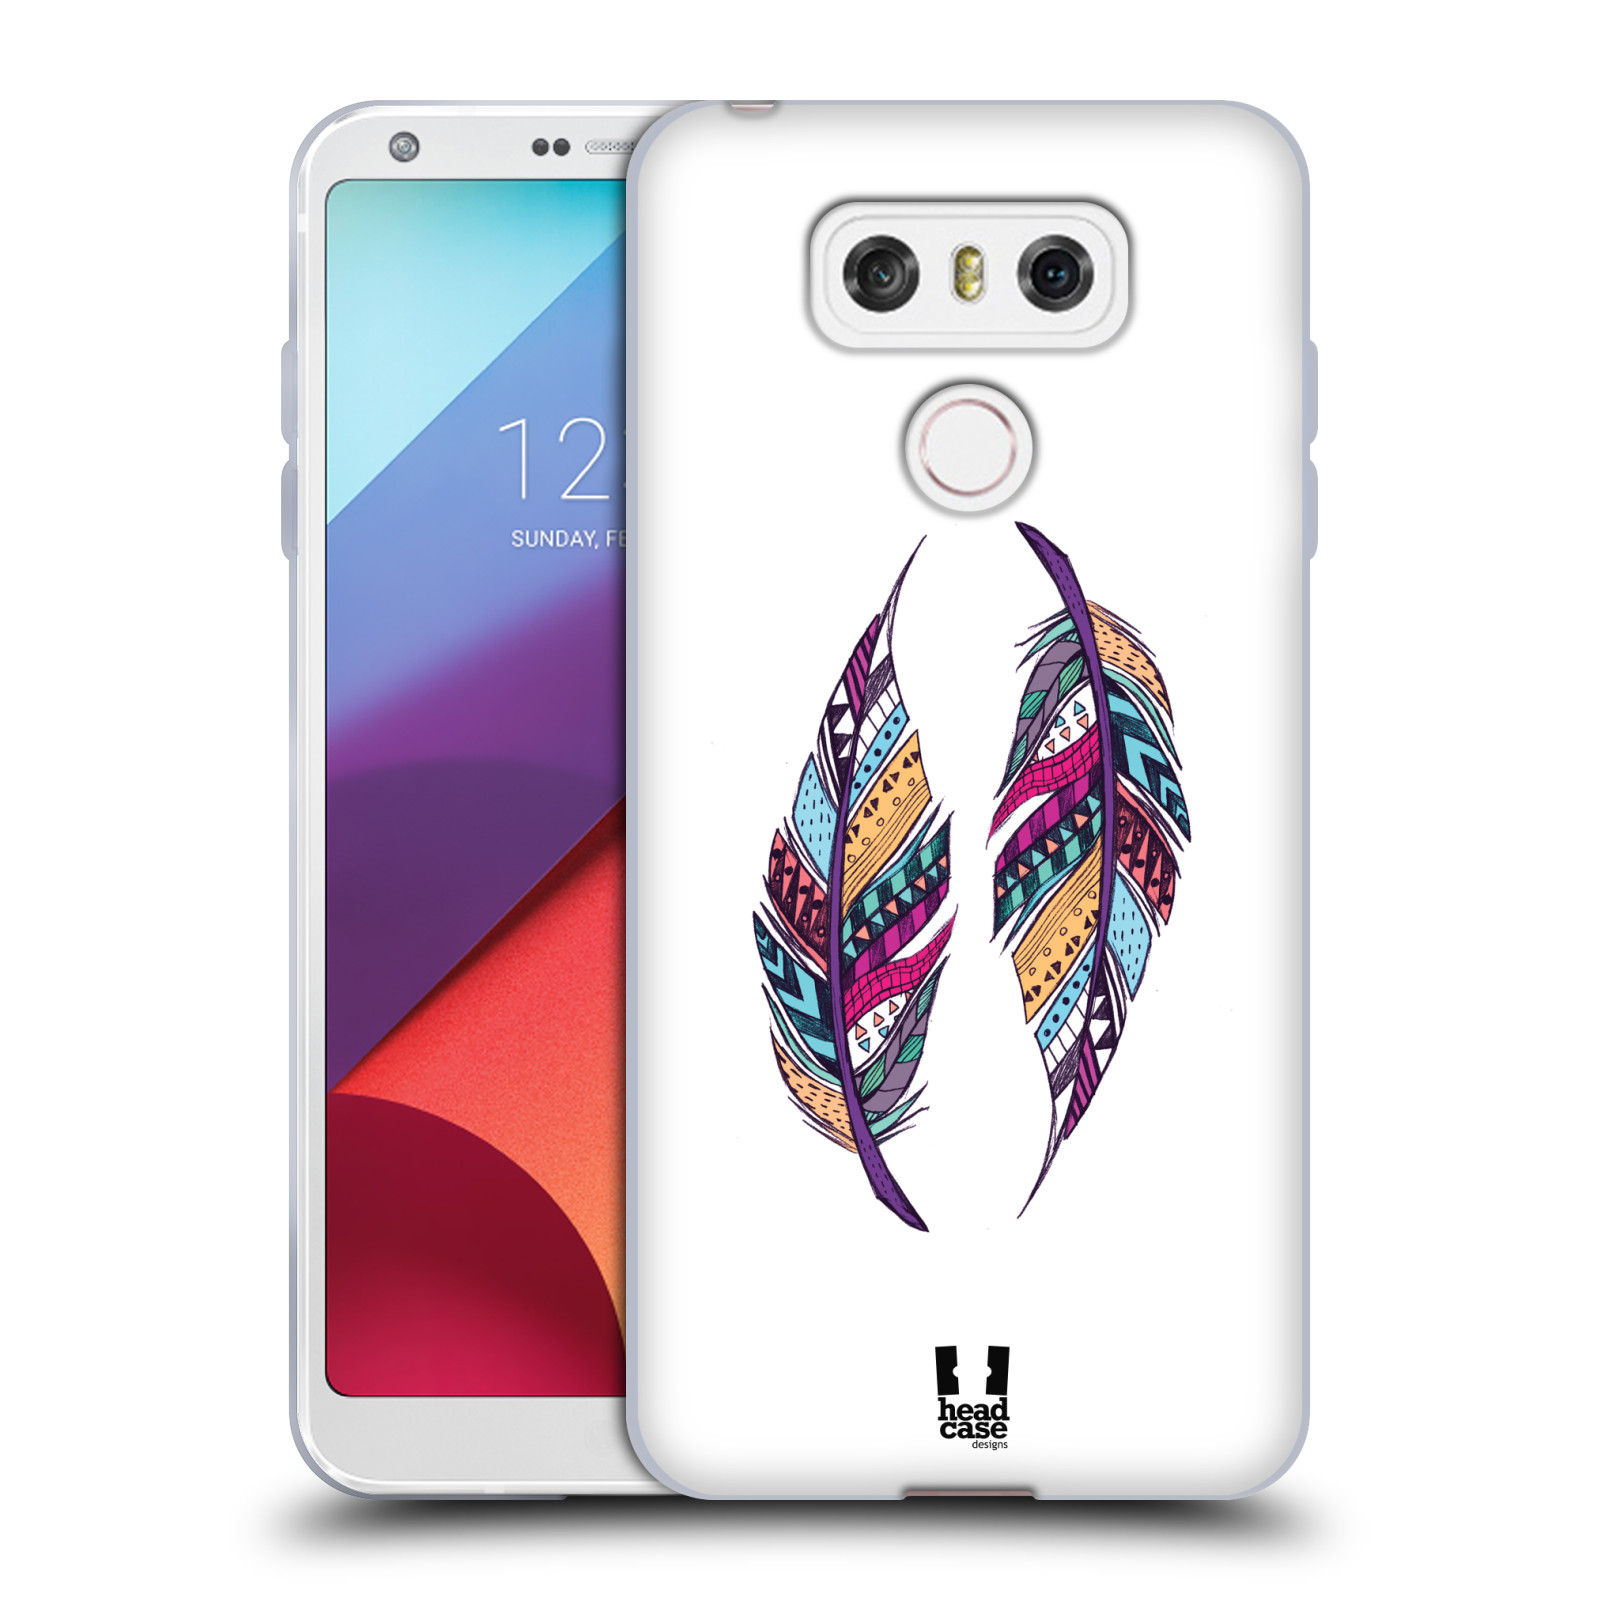 Silikonové pouzdro na mobil LG G6 - Head Case AZTEC PÍRKA